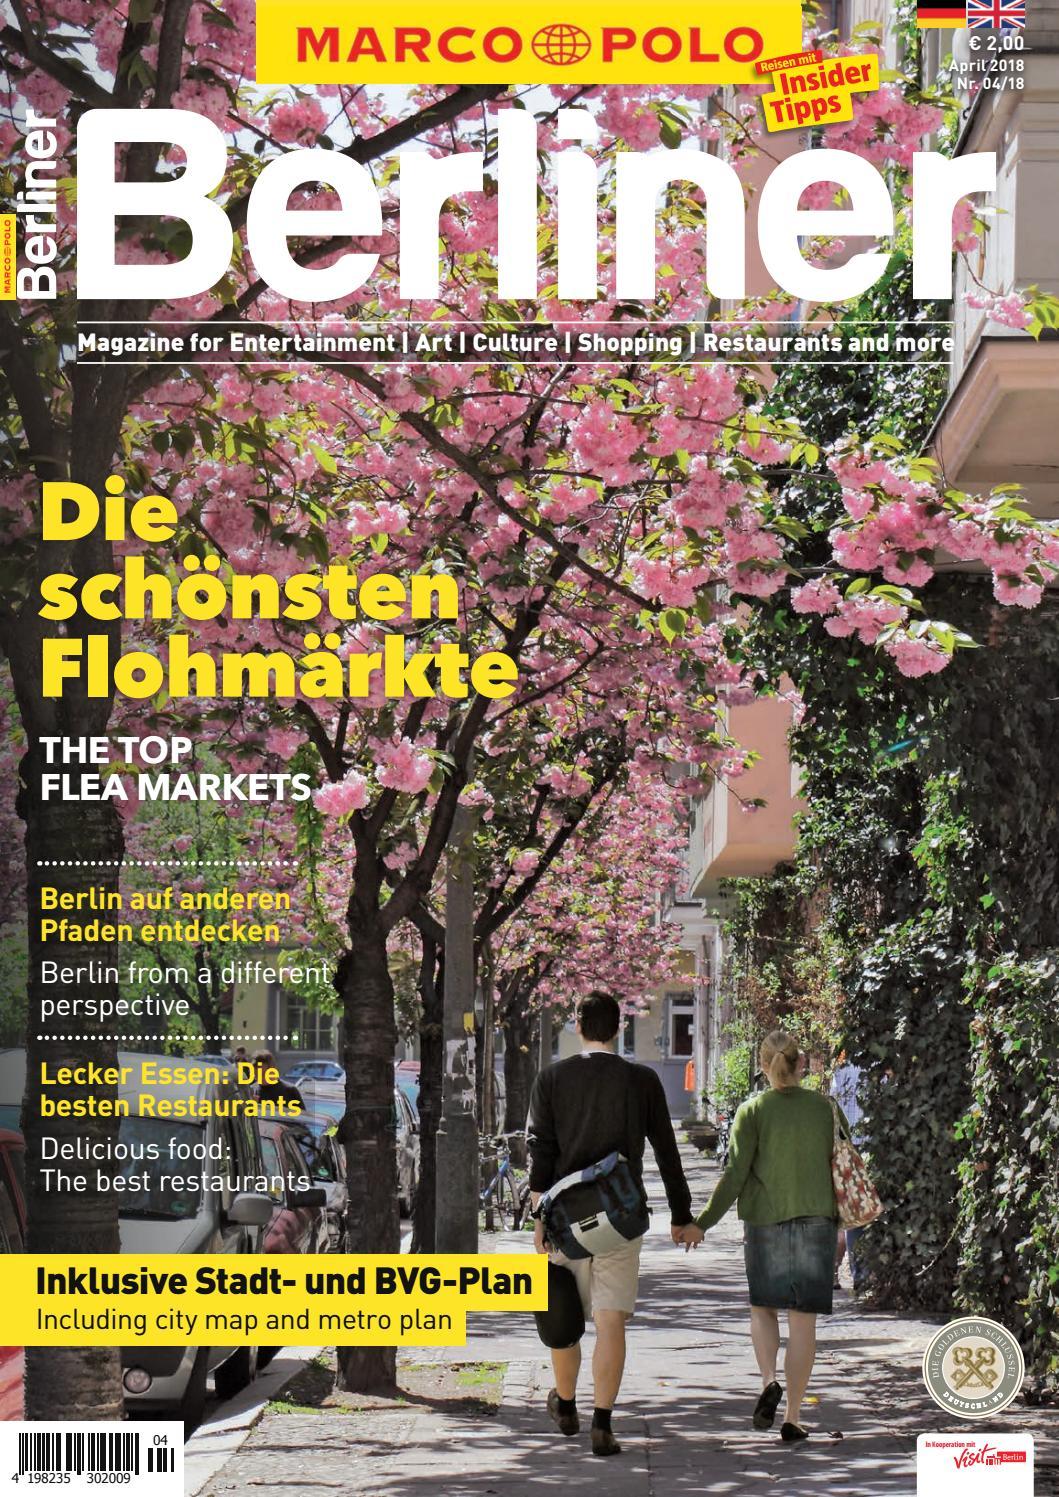 Marco Polo Berliner #04/2018 by Berlin Medien GmbH - issuu